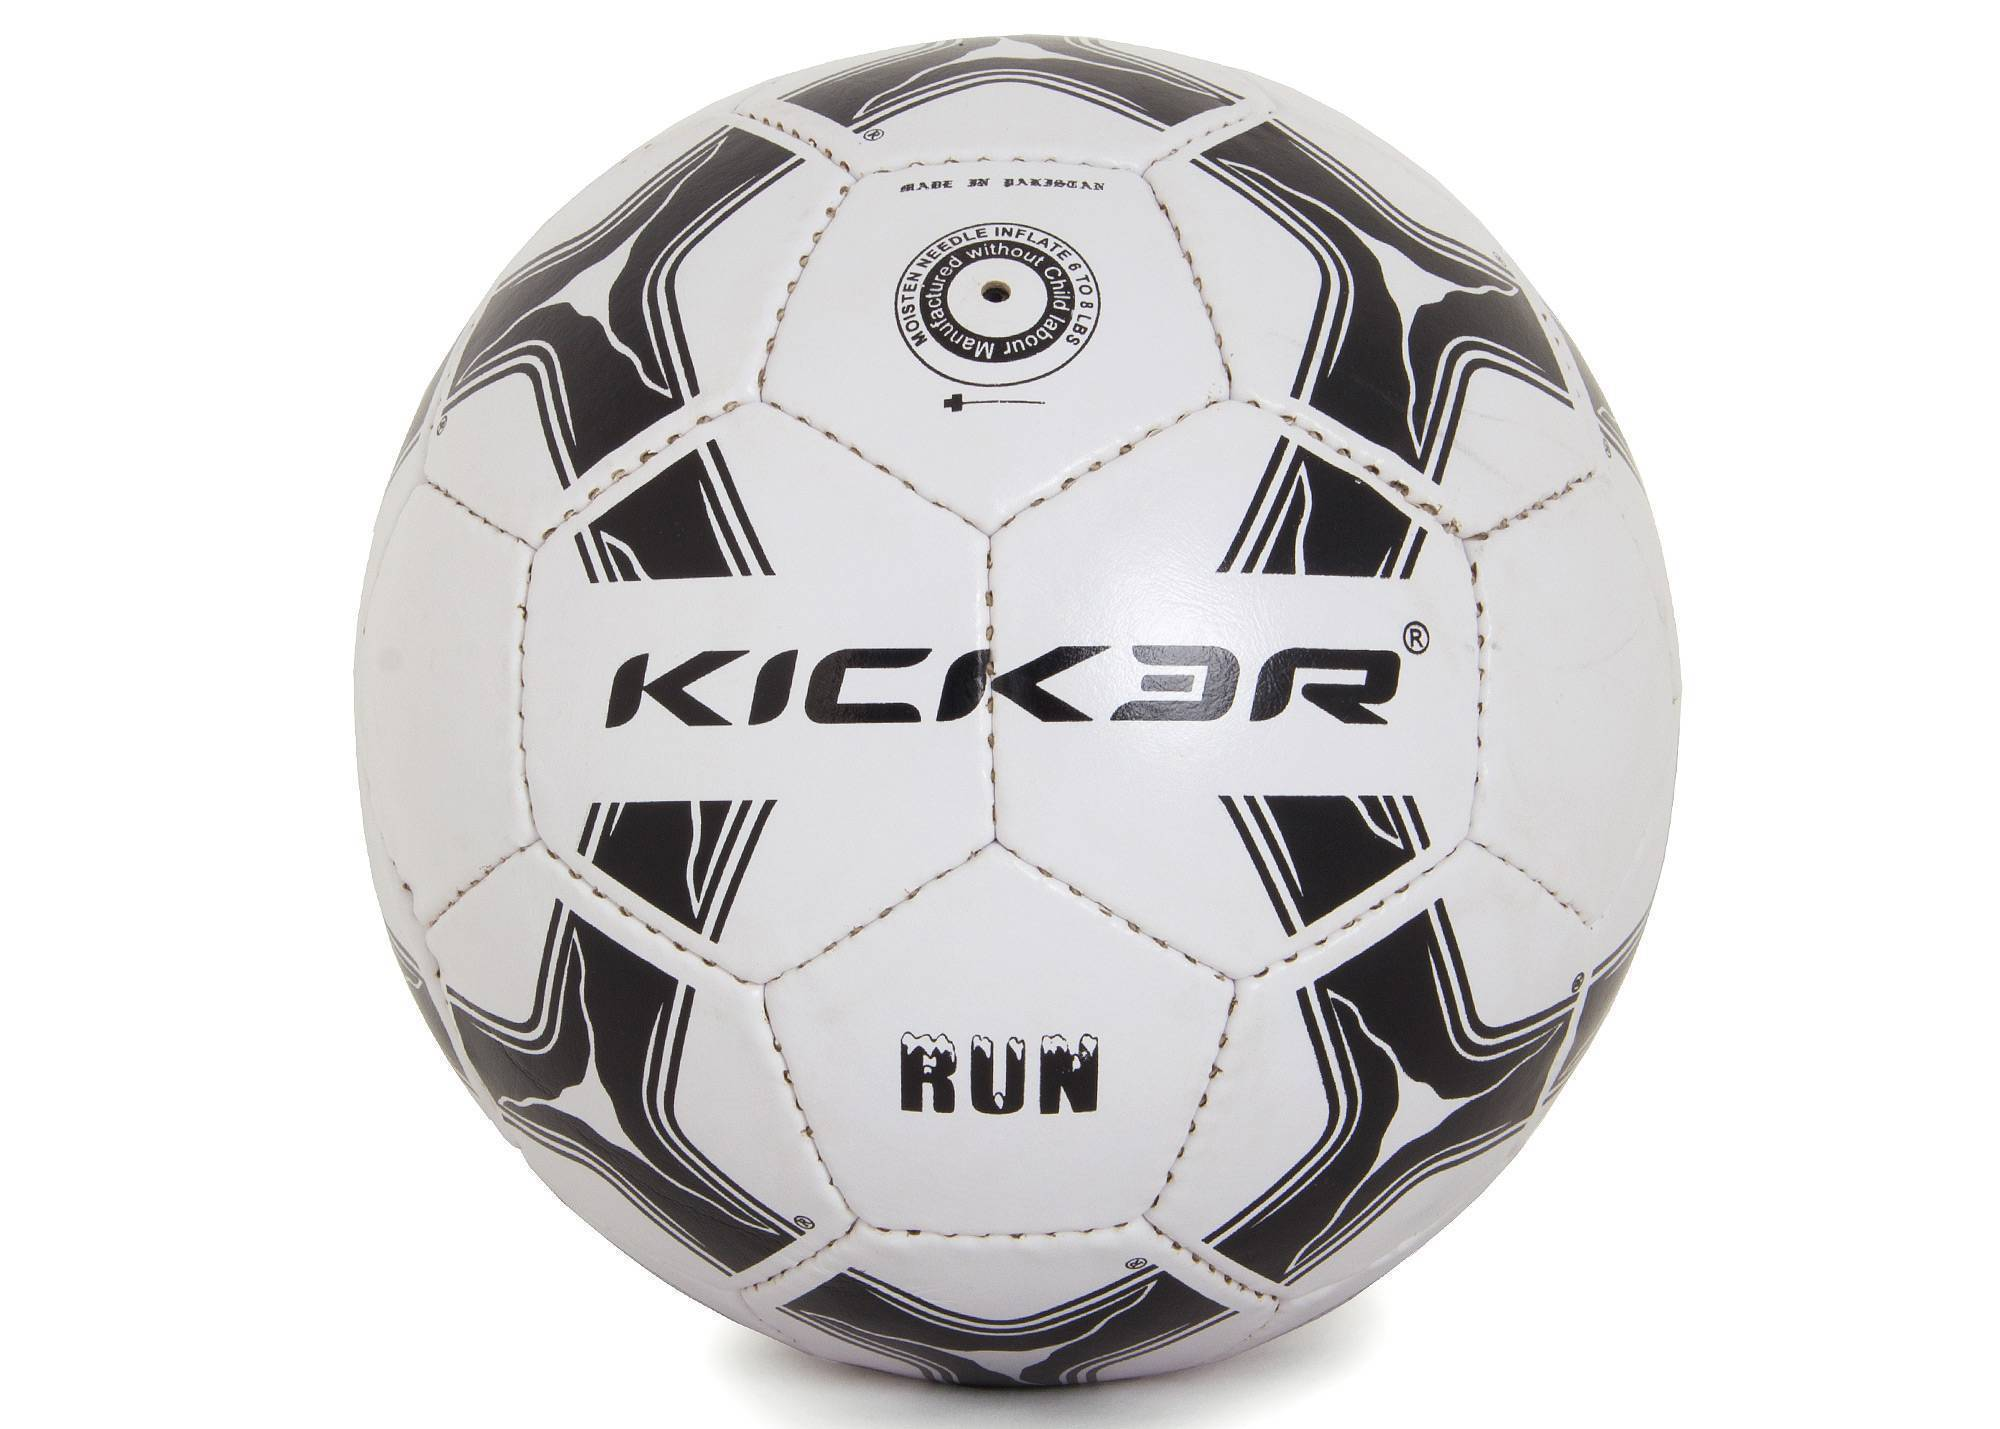 Футбольный мяч Kicker Kicker Run №5 white/black фото